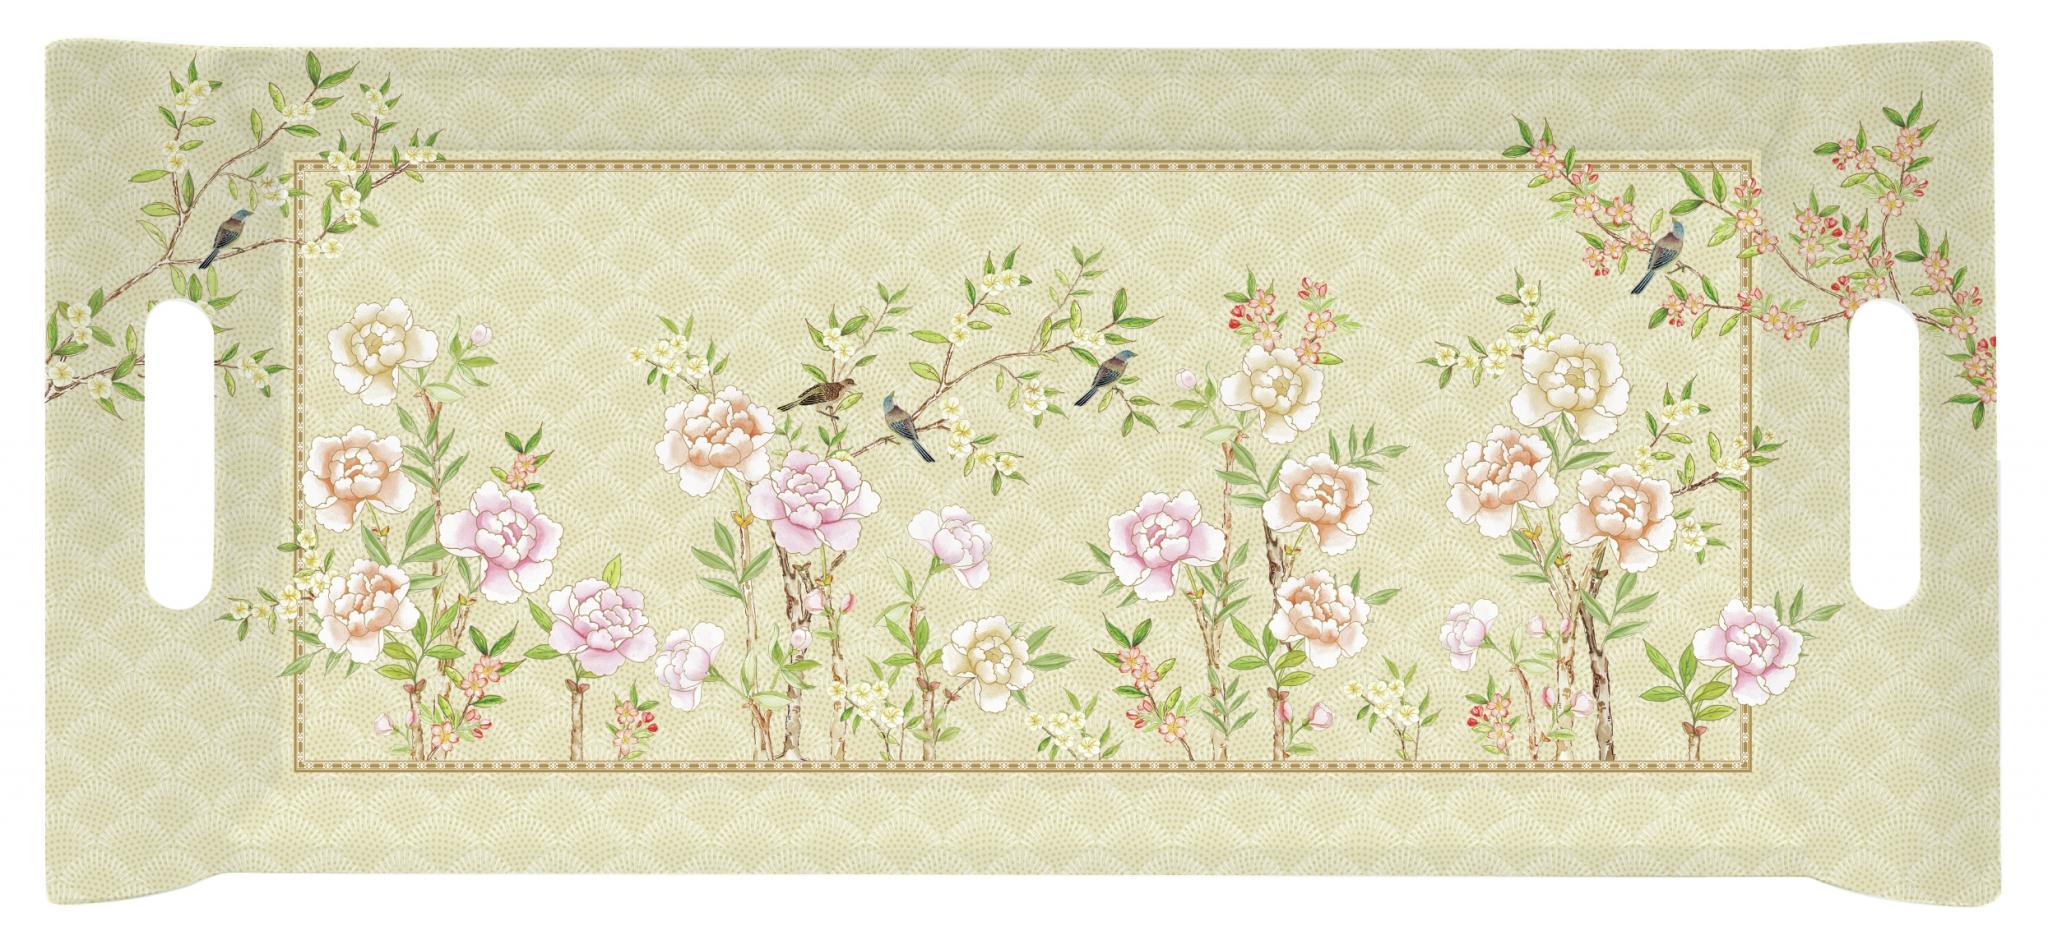 bandeja - Palace Garden floral